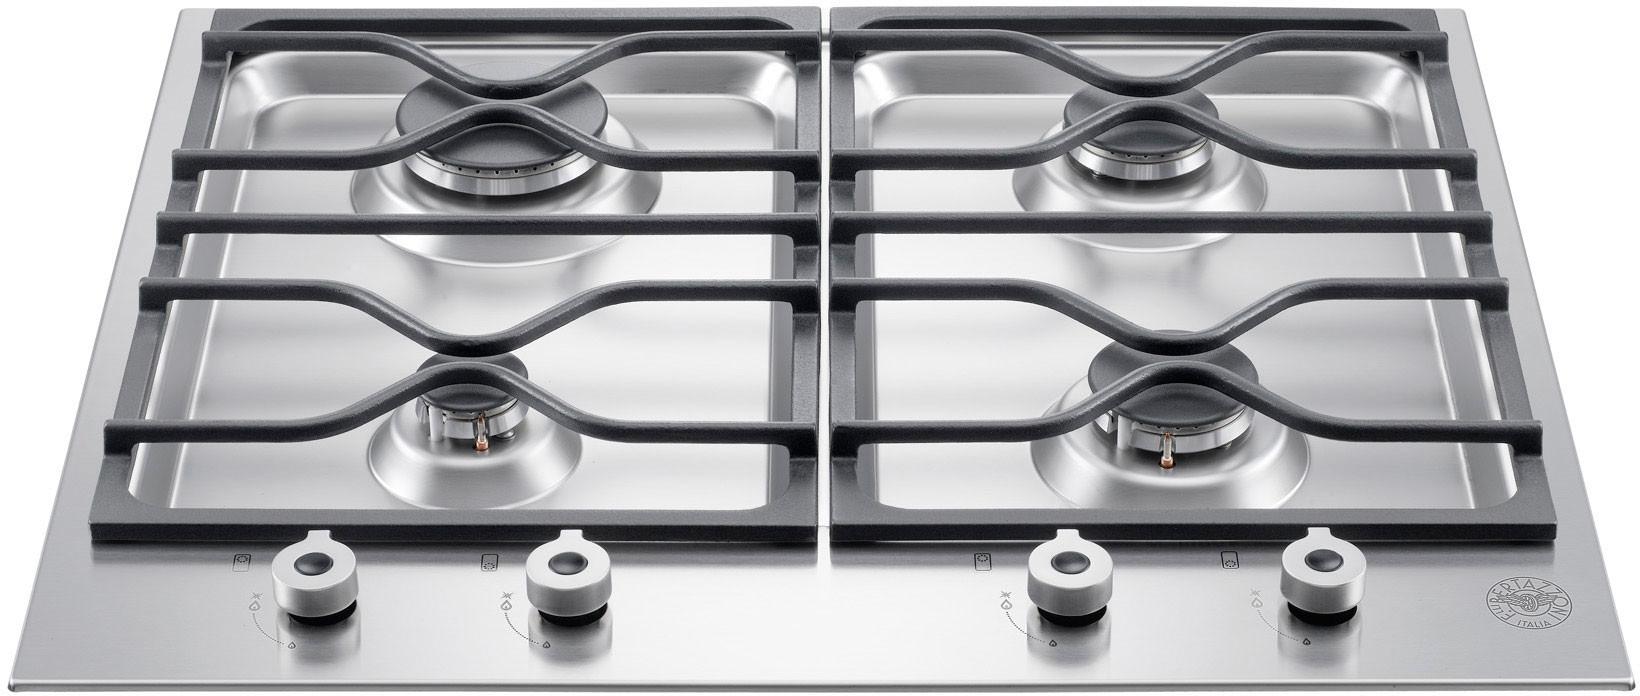 Bertazzoni Pm24400x 24 Inch Gas Cooktop